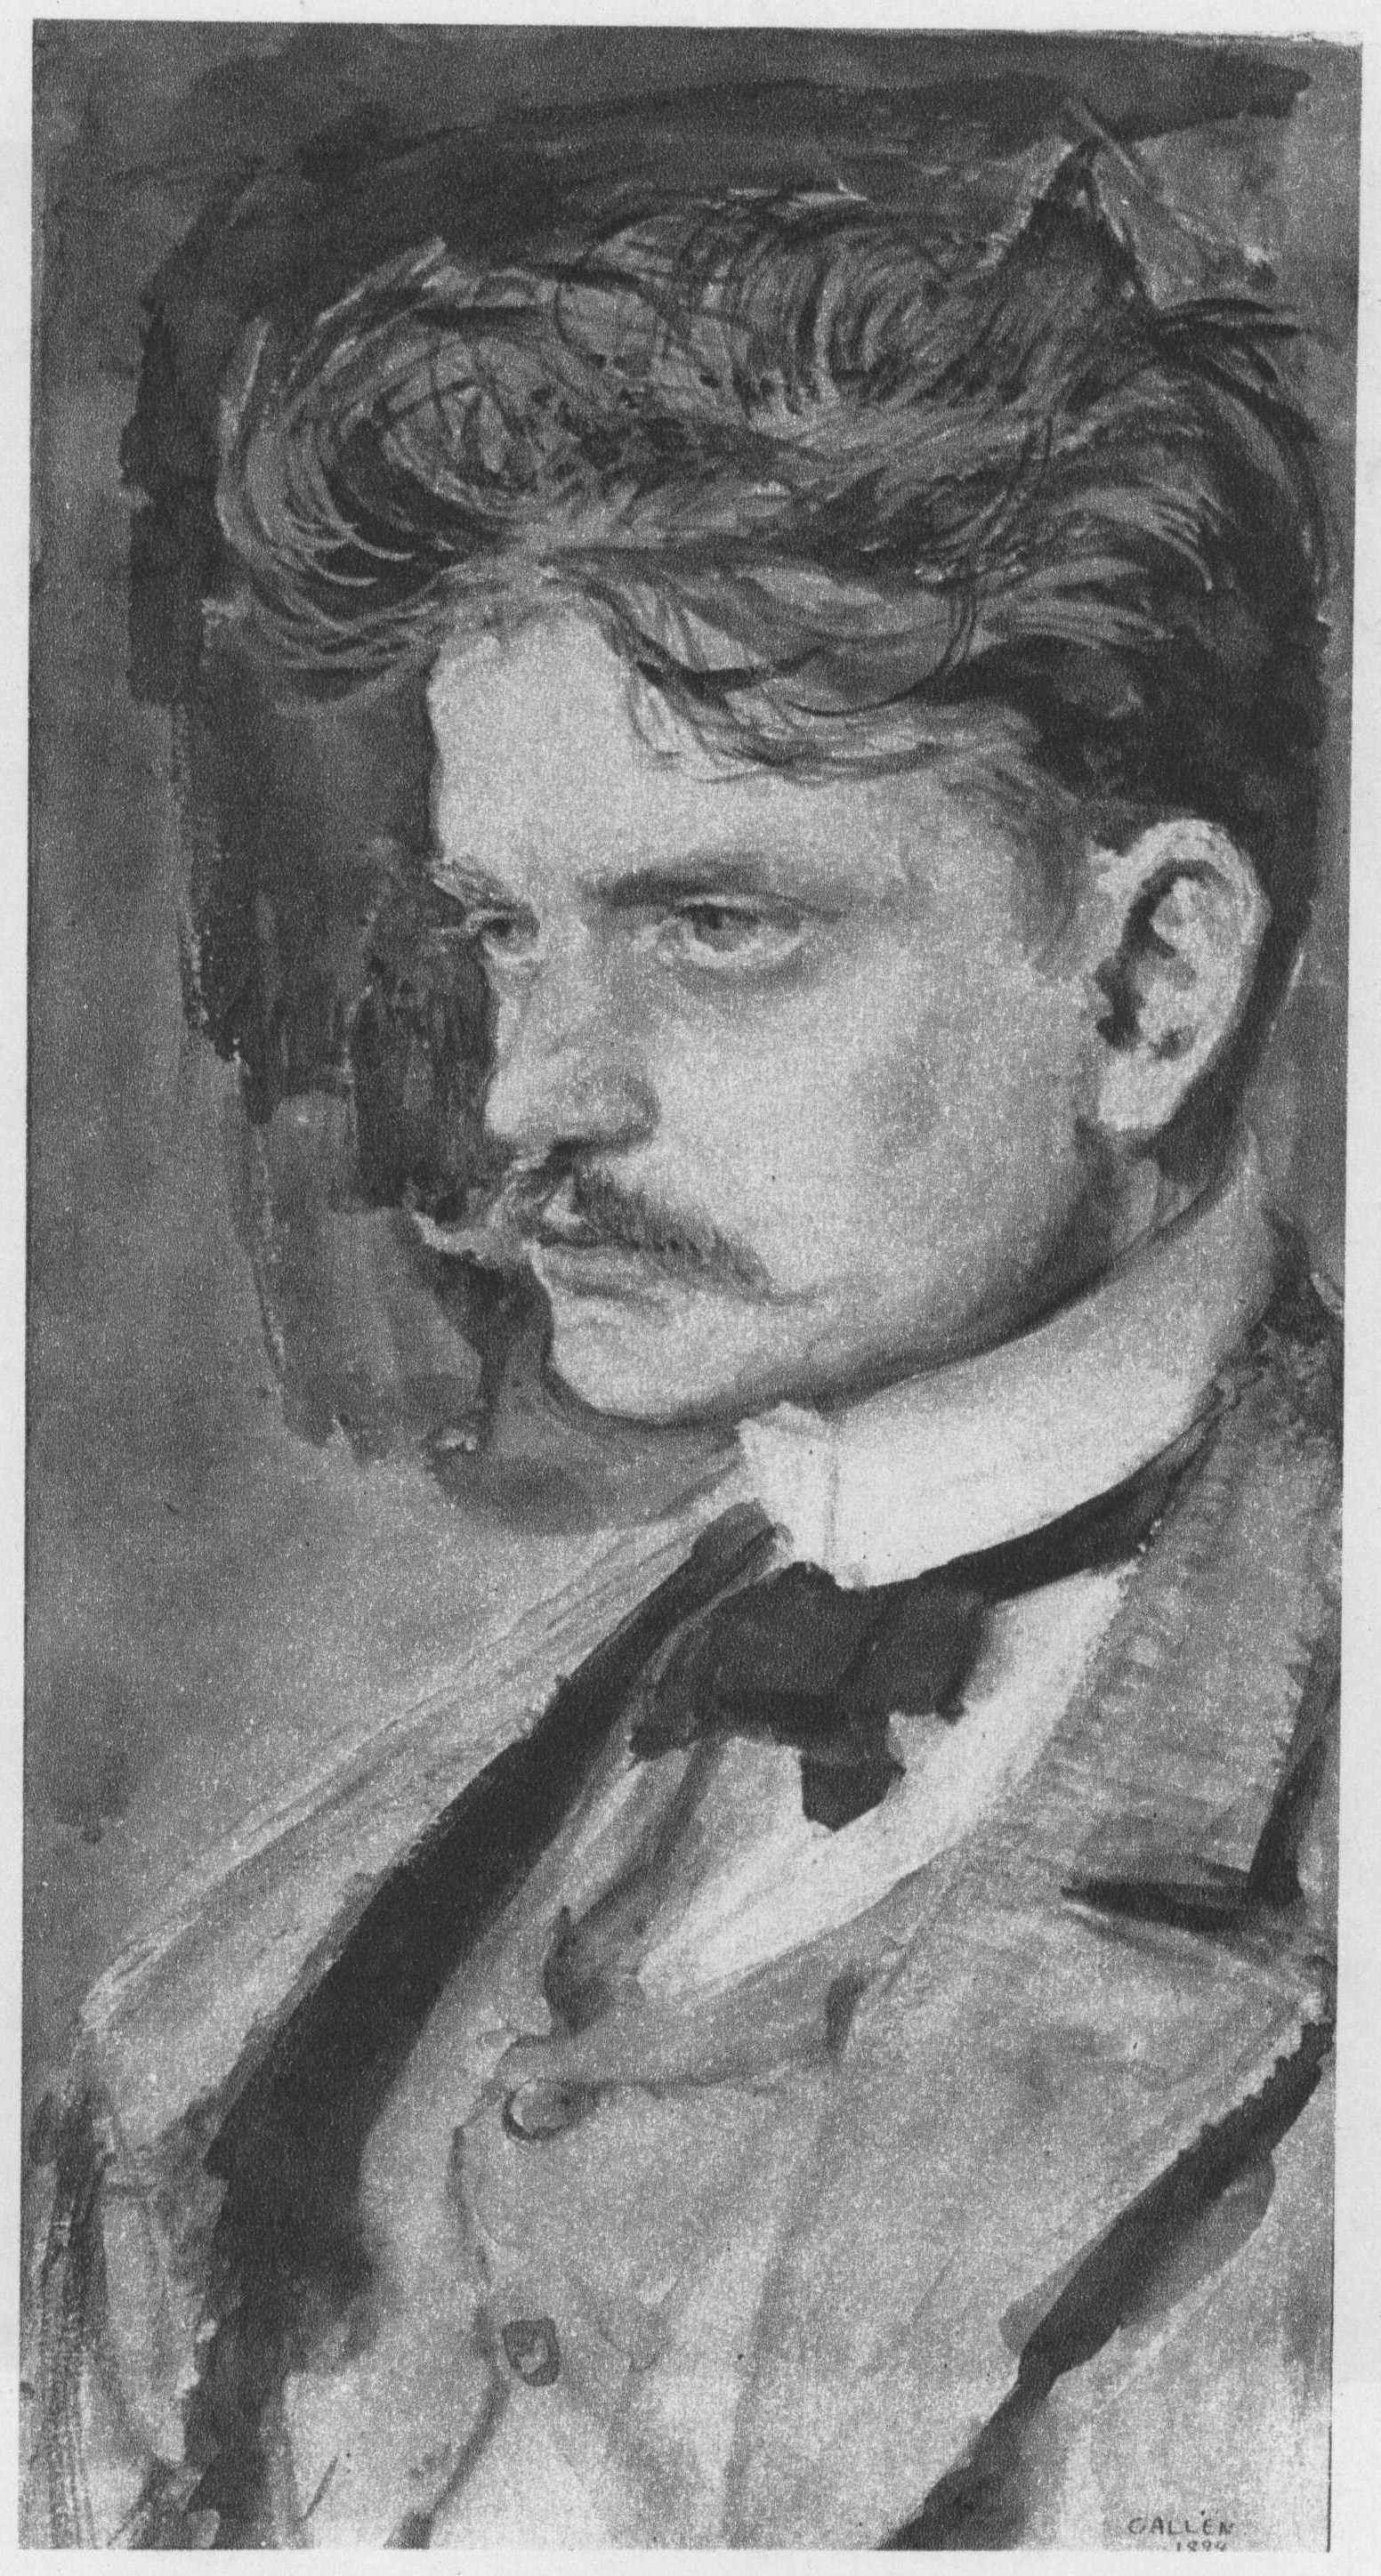 Jean Sibelius Sibelius - Leonard Bernstein - Symphonies Nos. 5 and 6